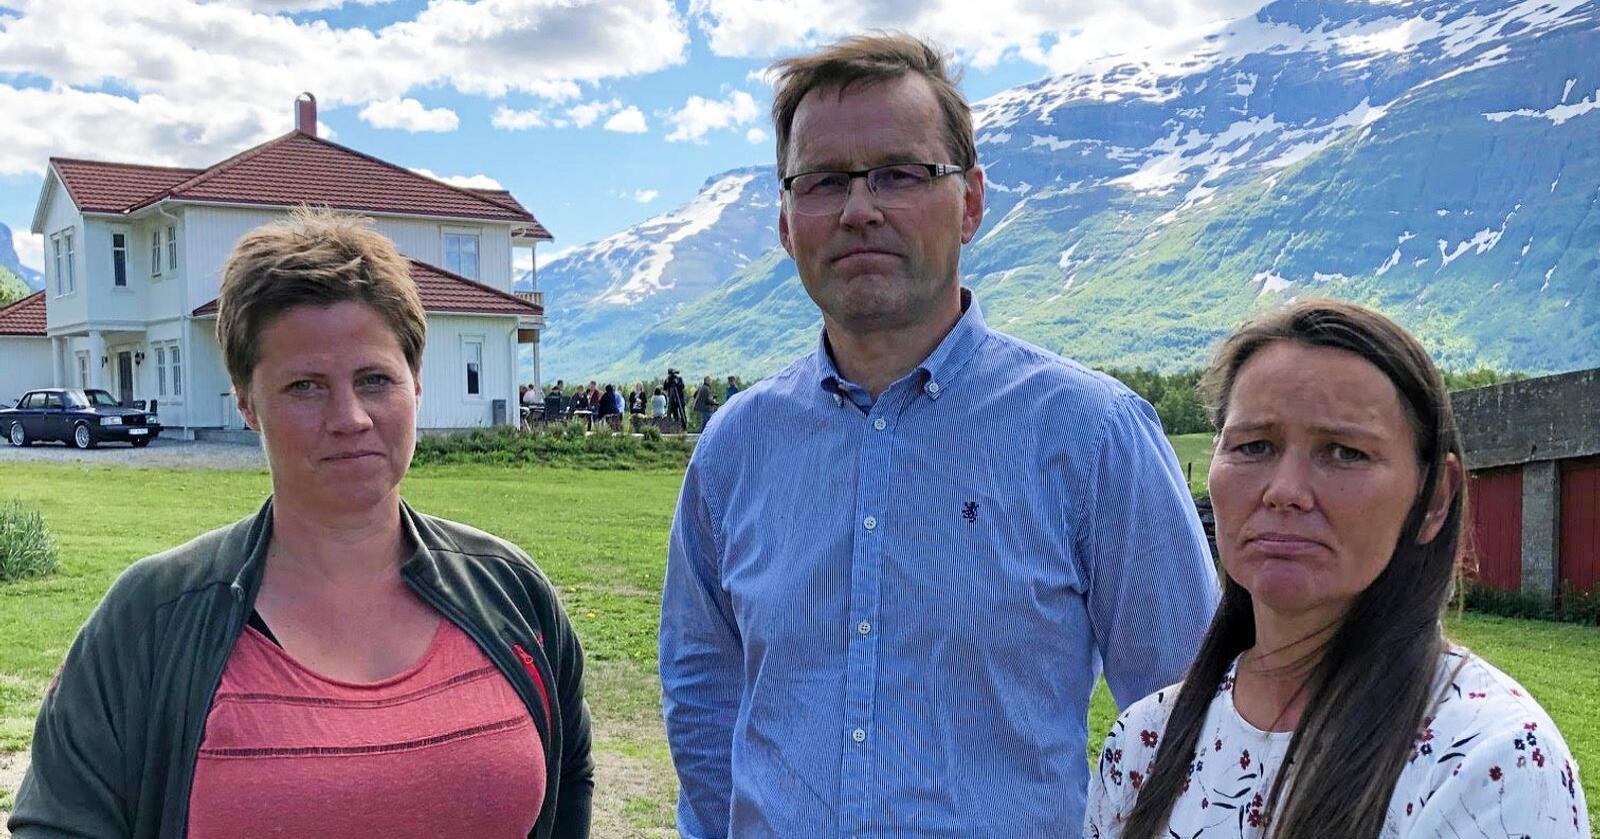 Mandag 6.juli besøkte statssekretær i Klima- og miljødepartementet Maren Hersleth Holsen (V) og Widar Skogan (KrF) i Landbruks-og matdepartementet Bardu kommune i Indre Troms.T.v: Sauebonde Laila Merete Myrvang.